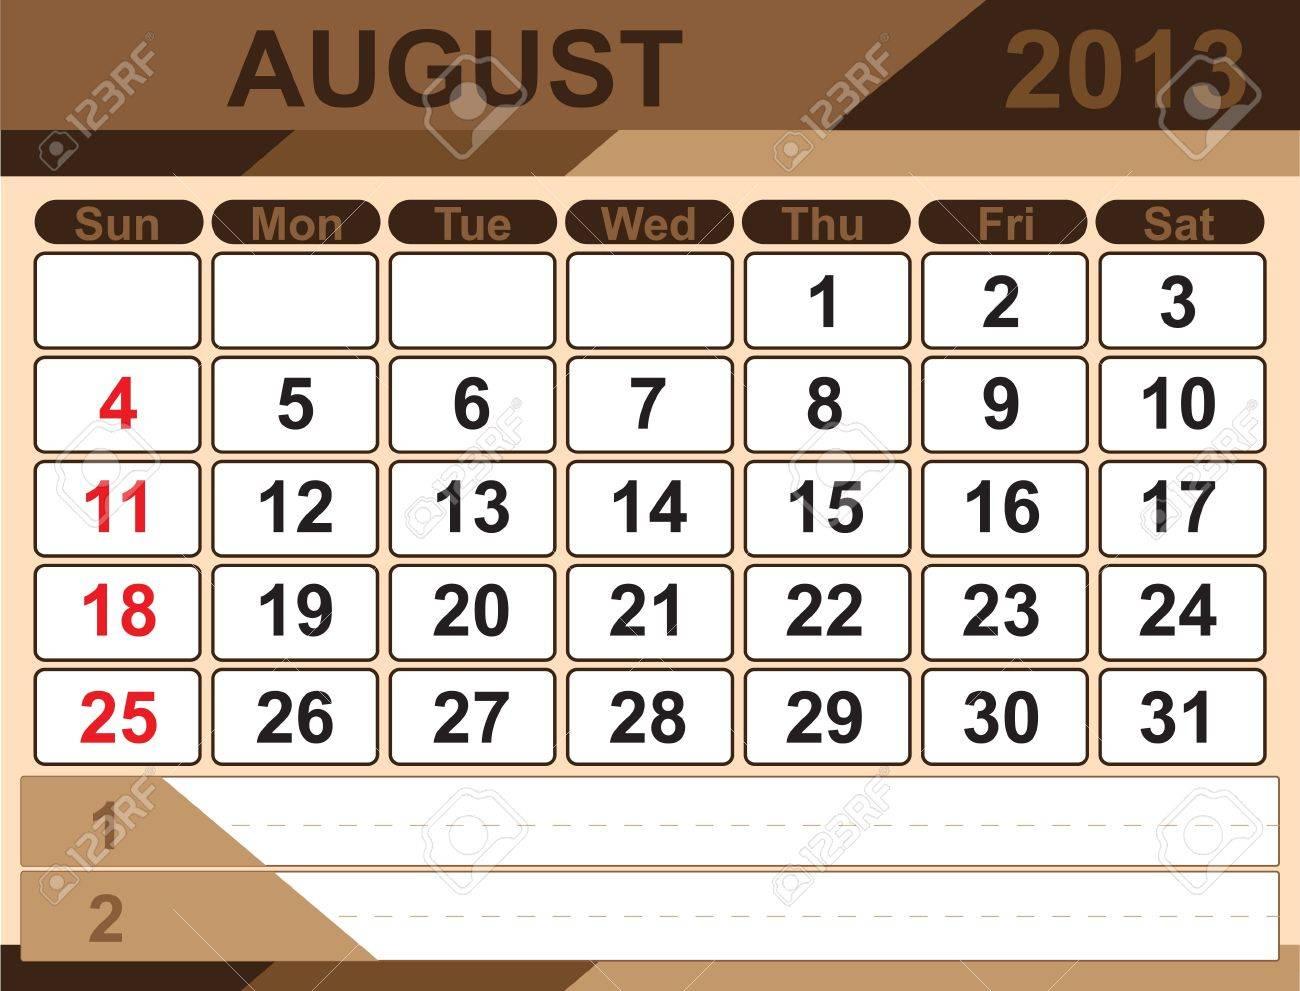 Vector calendar AUGUST 2013 Stock Vector - 16255324